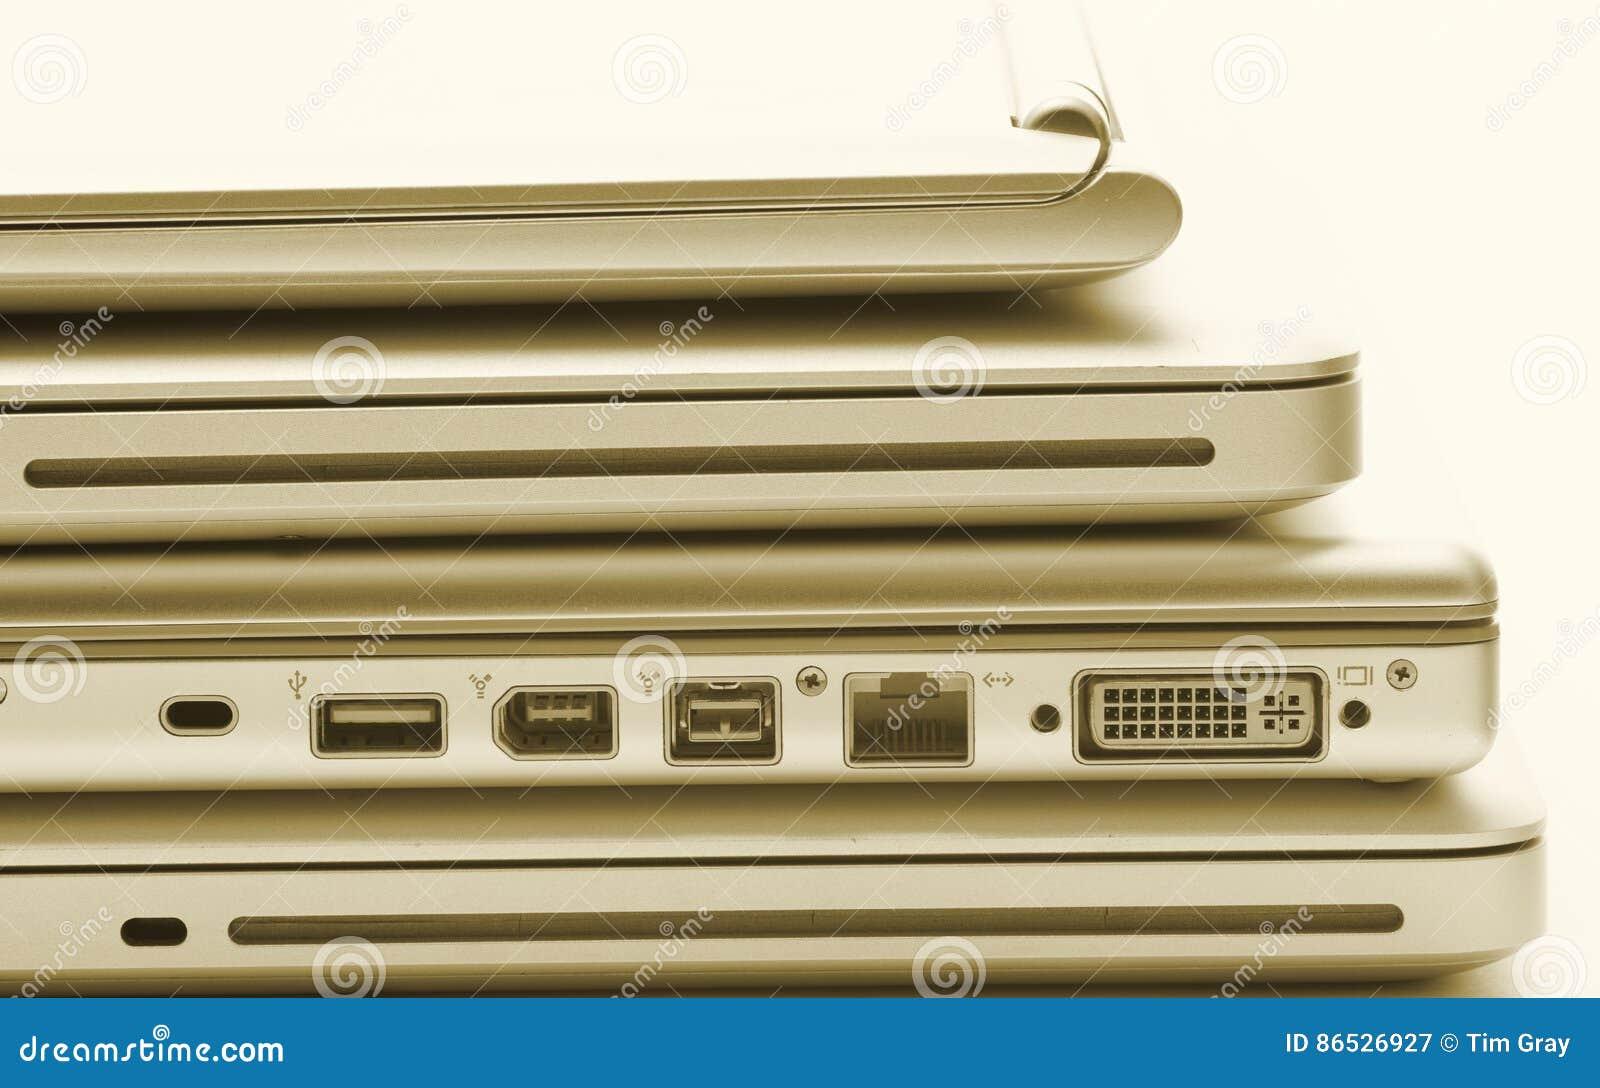 Laptop gold